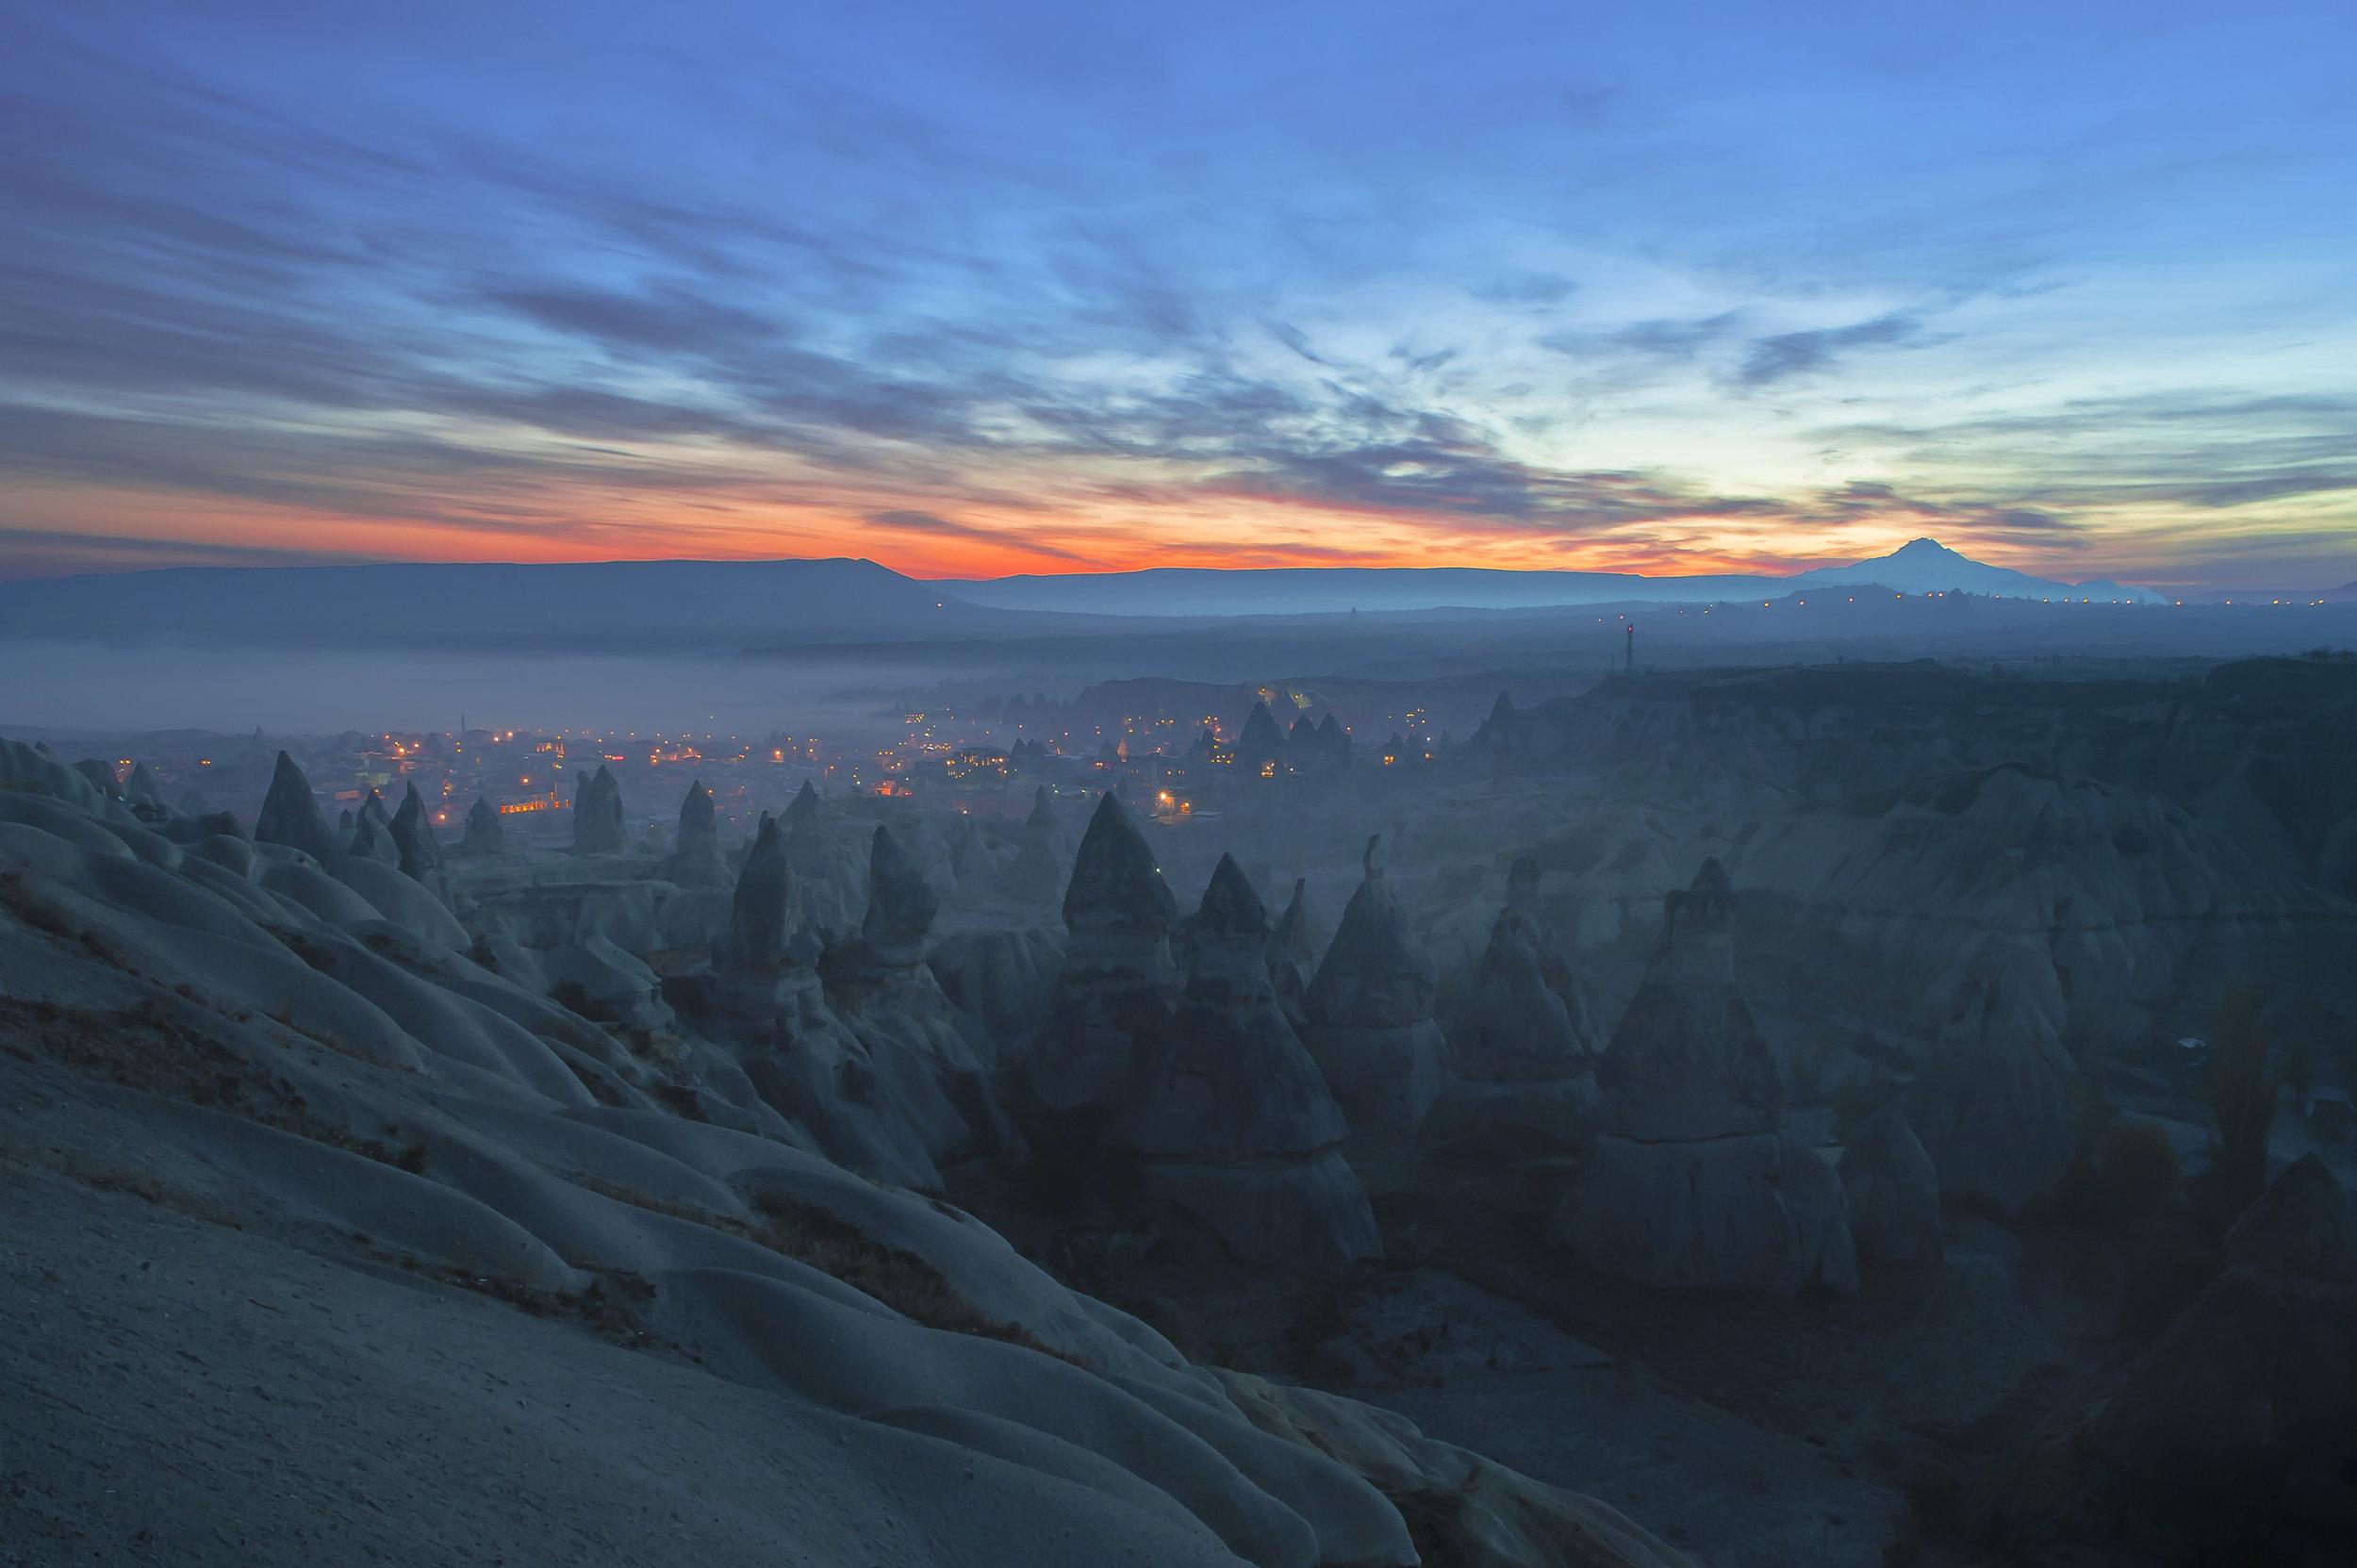 cappadocia115.jpg